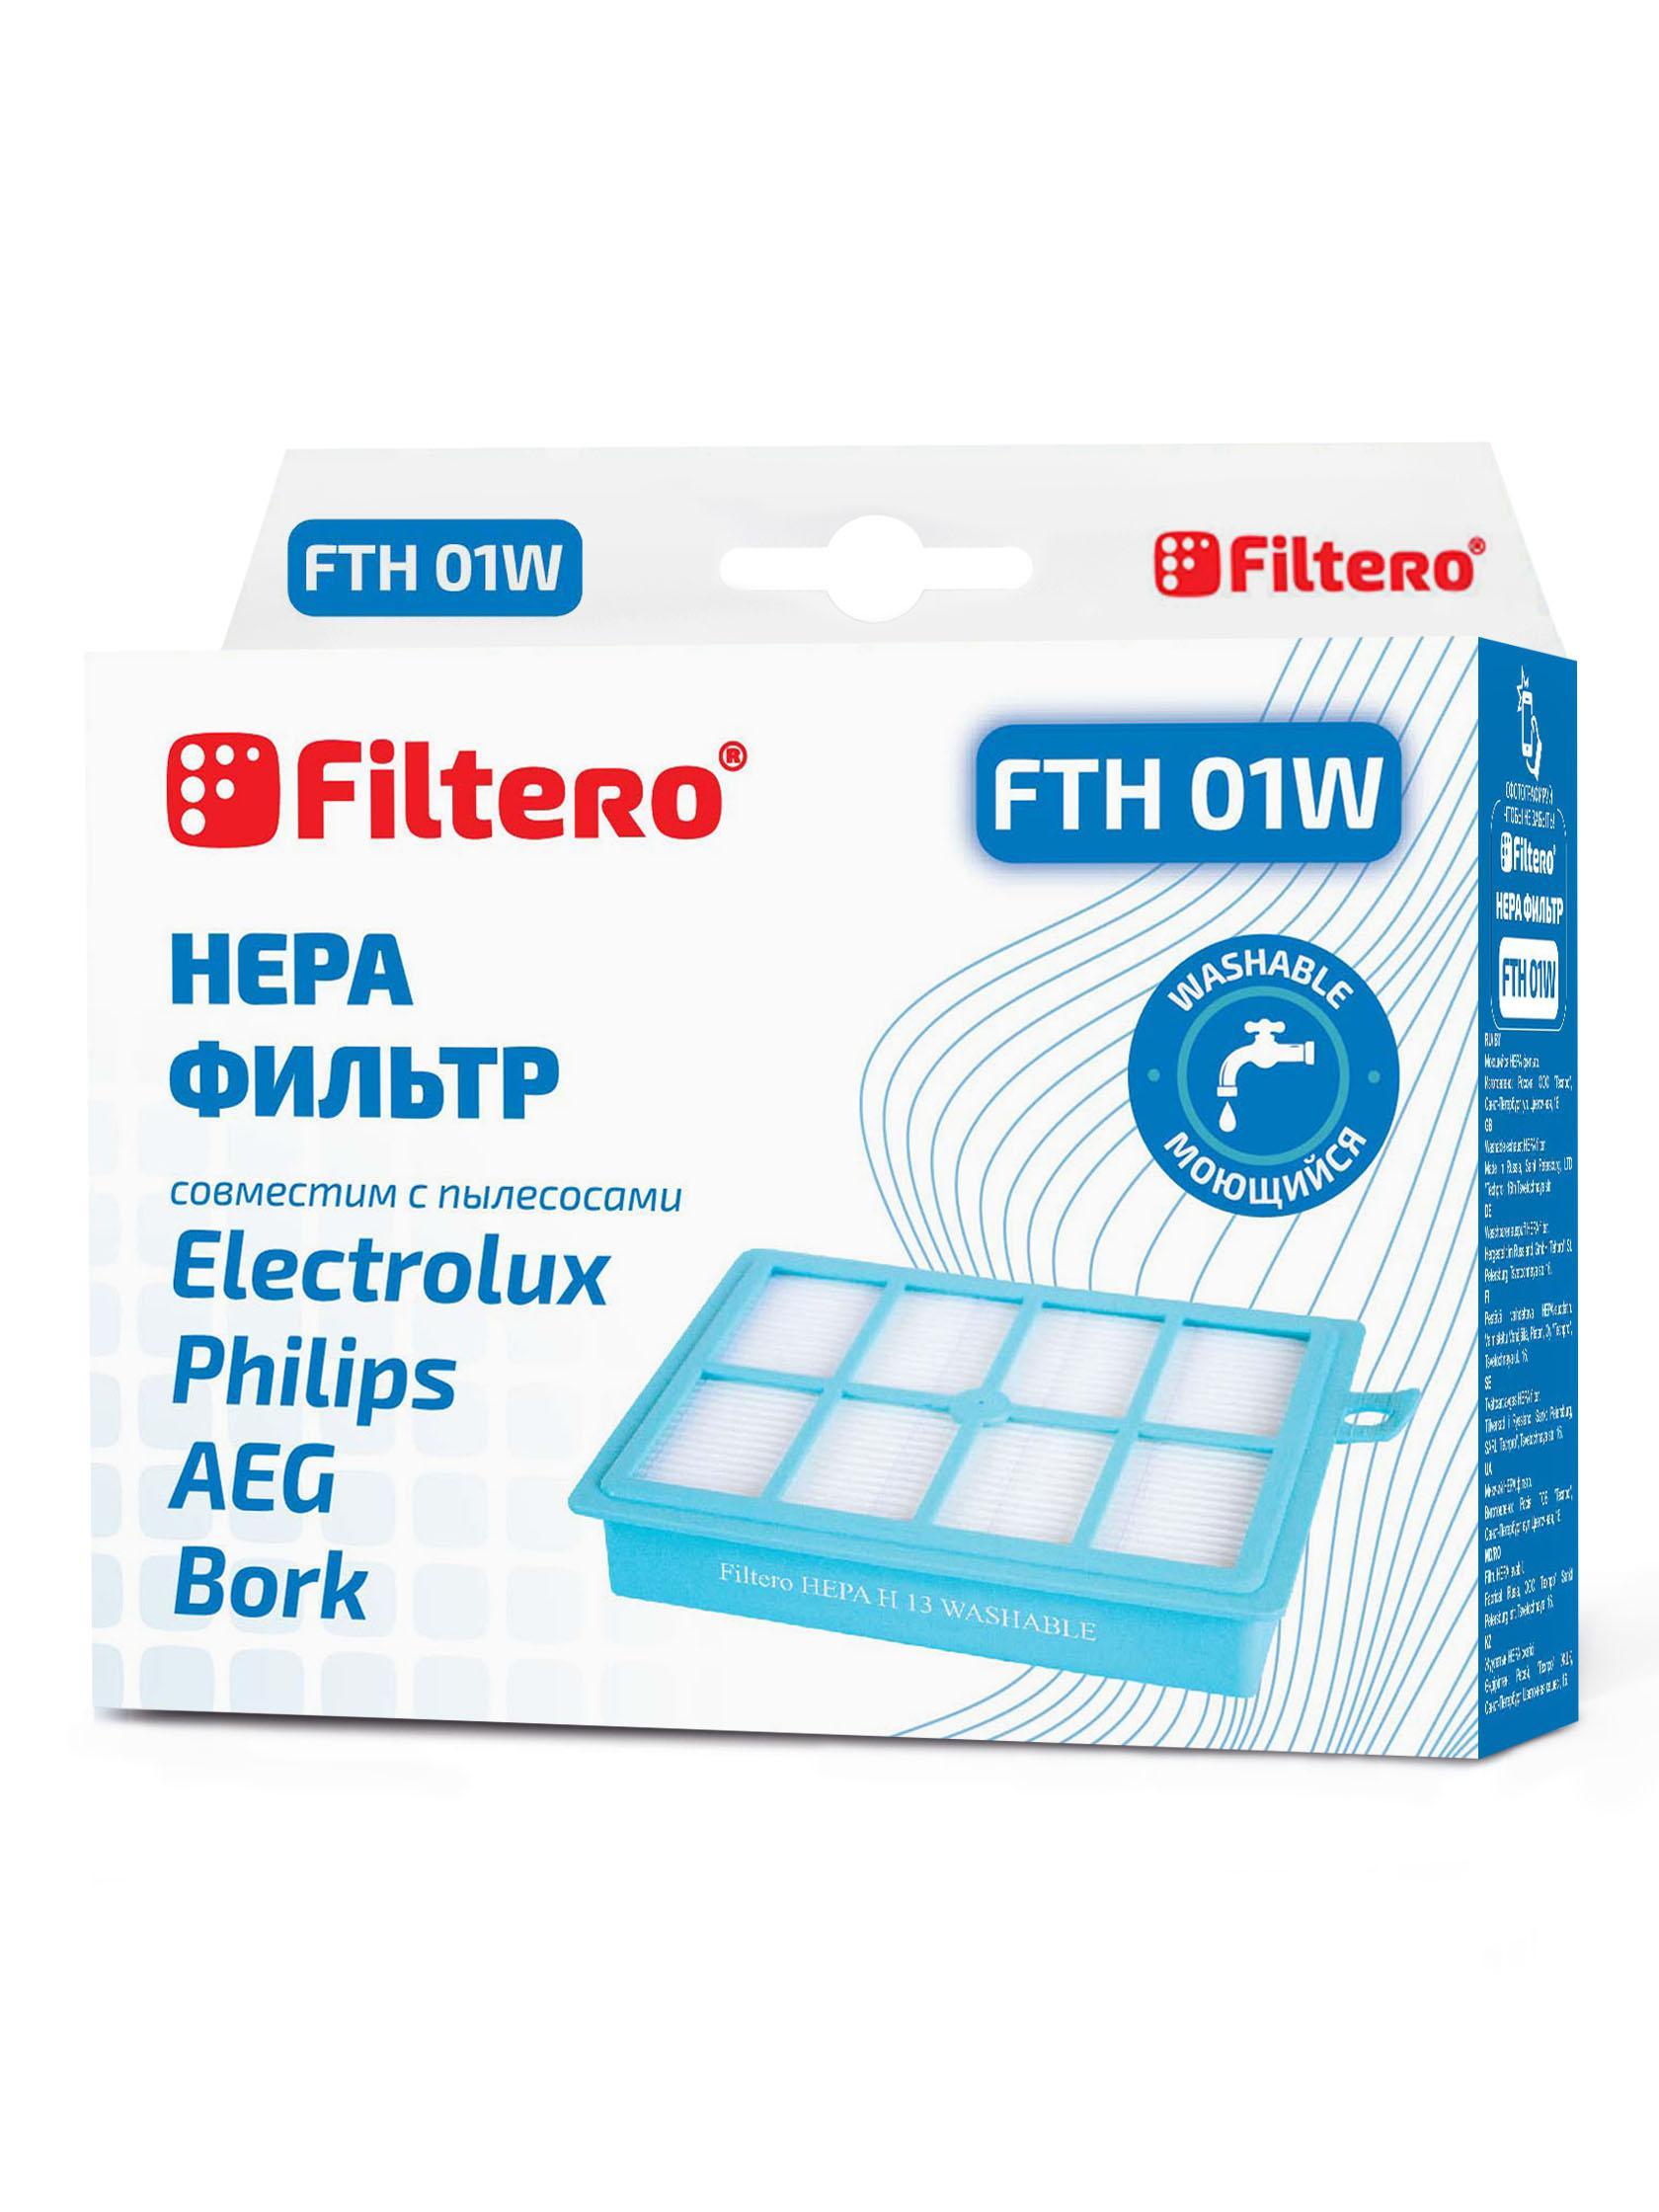 Фильтр Filtero Fth 01 w elx цены